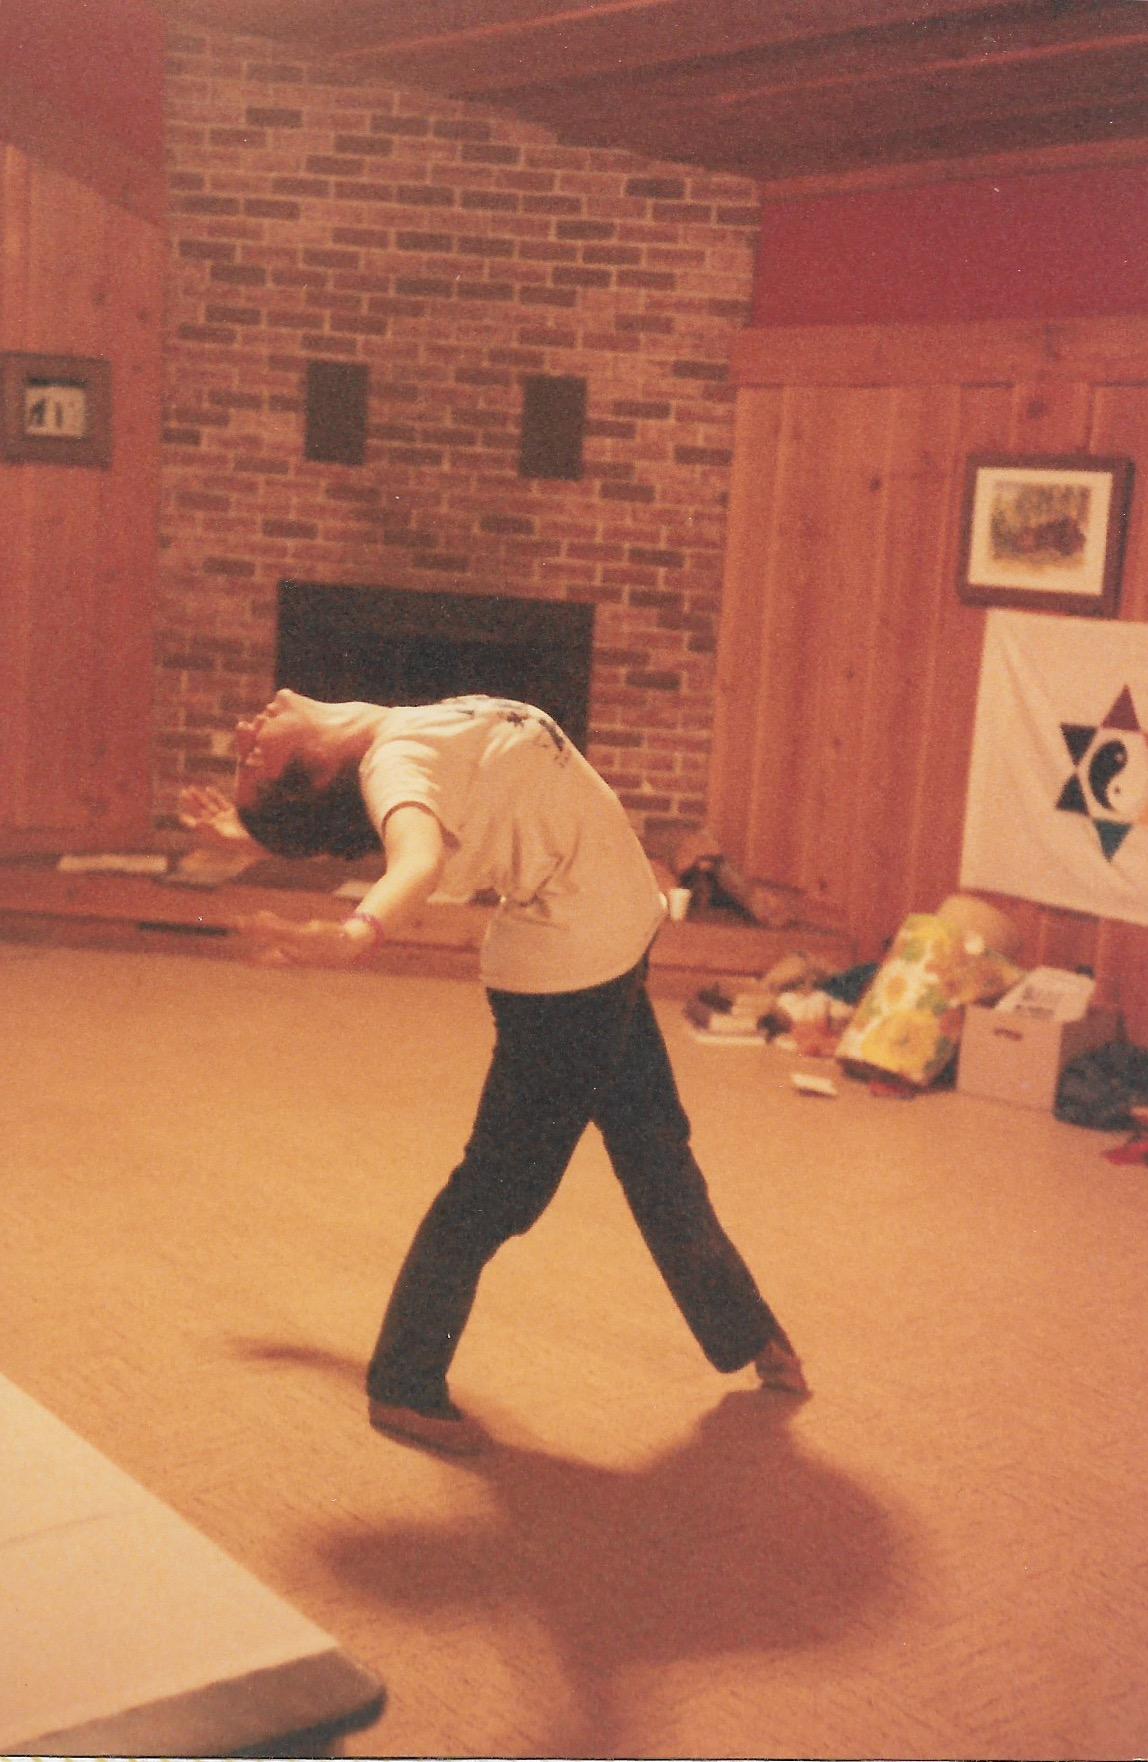 87 Joys  Maya Wallach dancing to Jeff Celnik's playing piano, Rainbow Star of David in background copy.jpeg